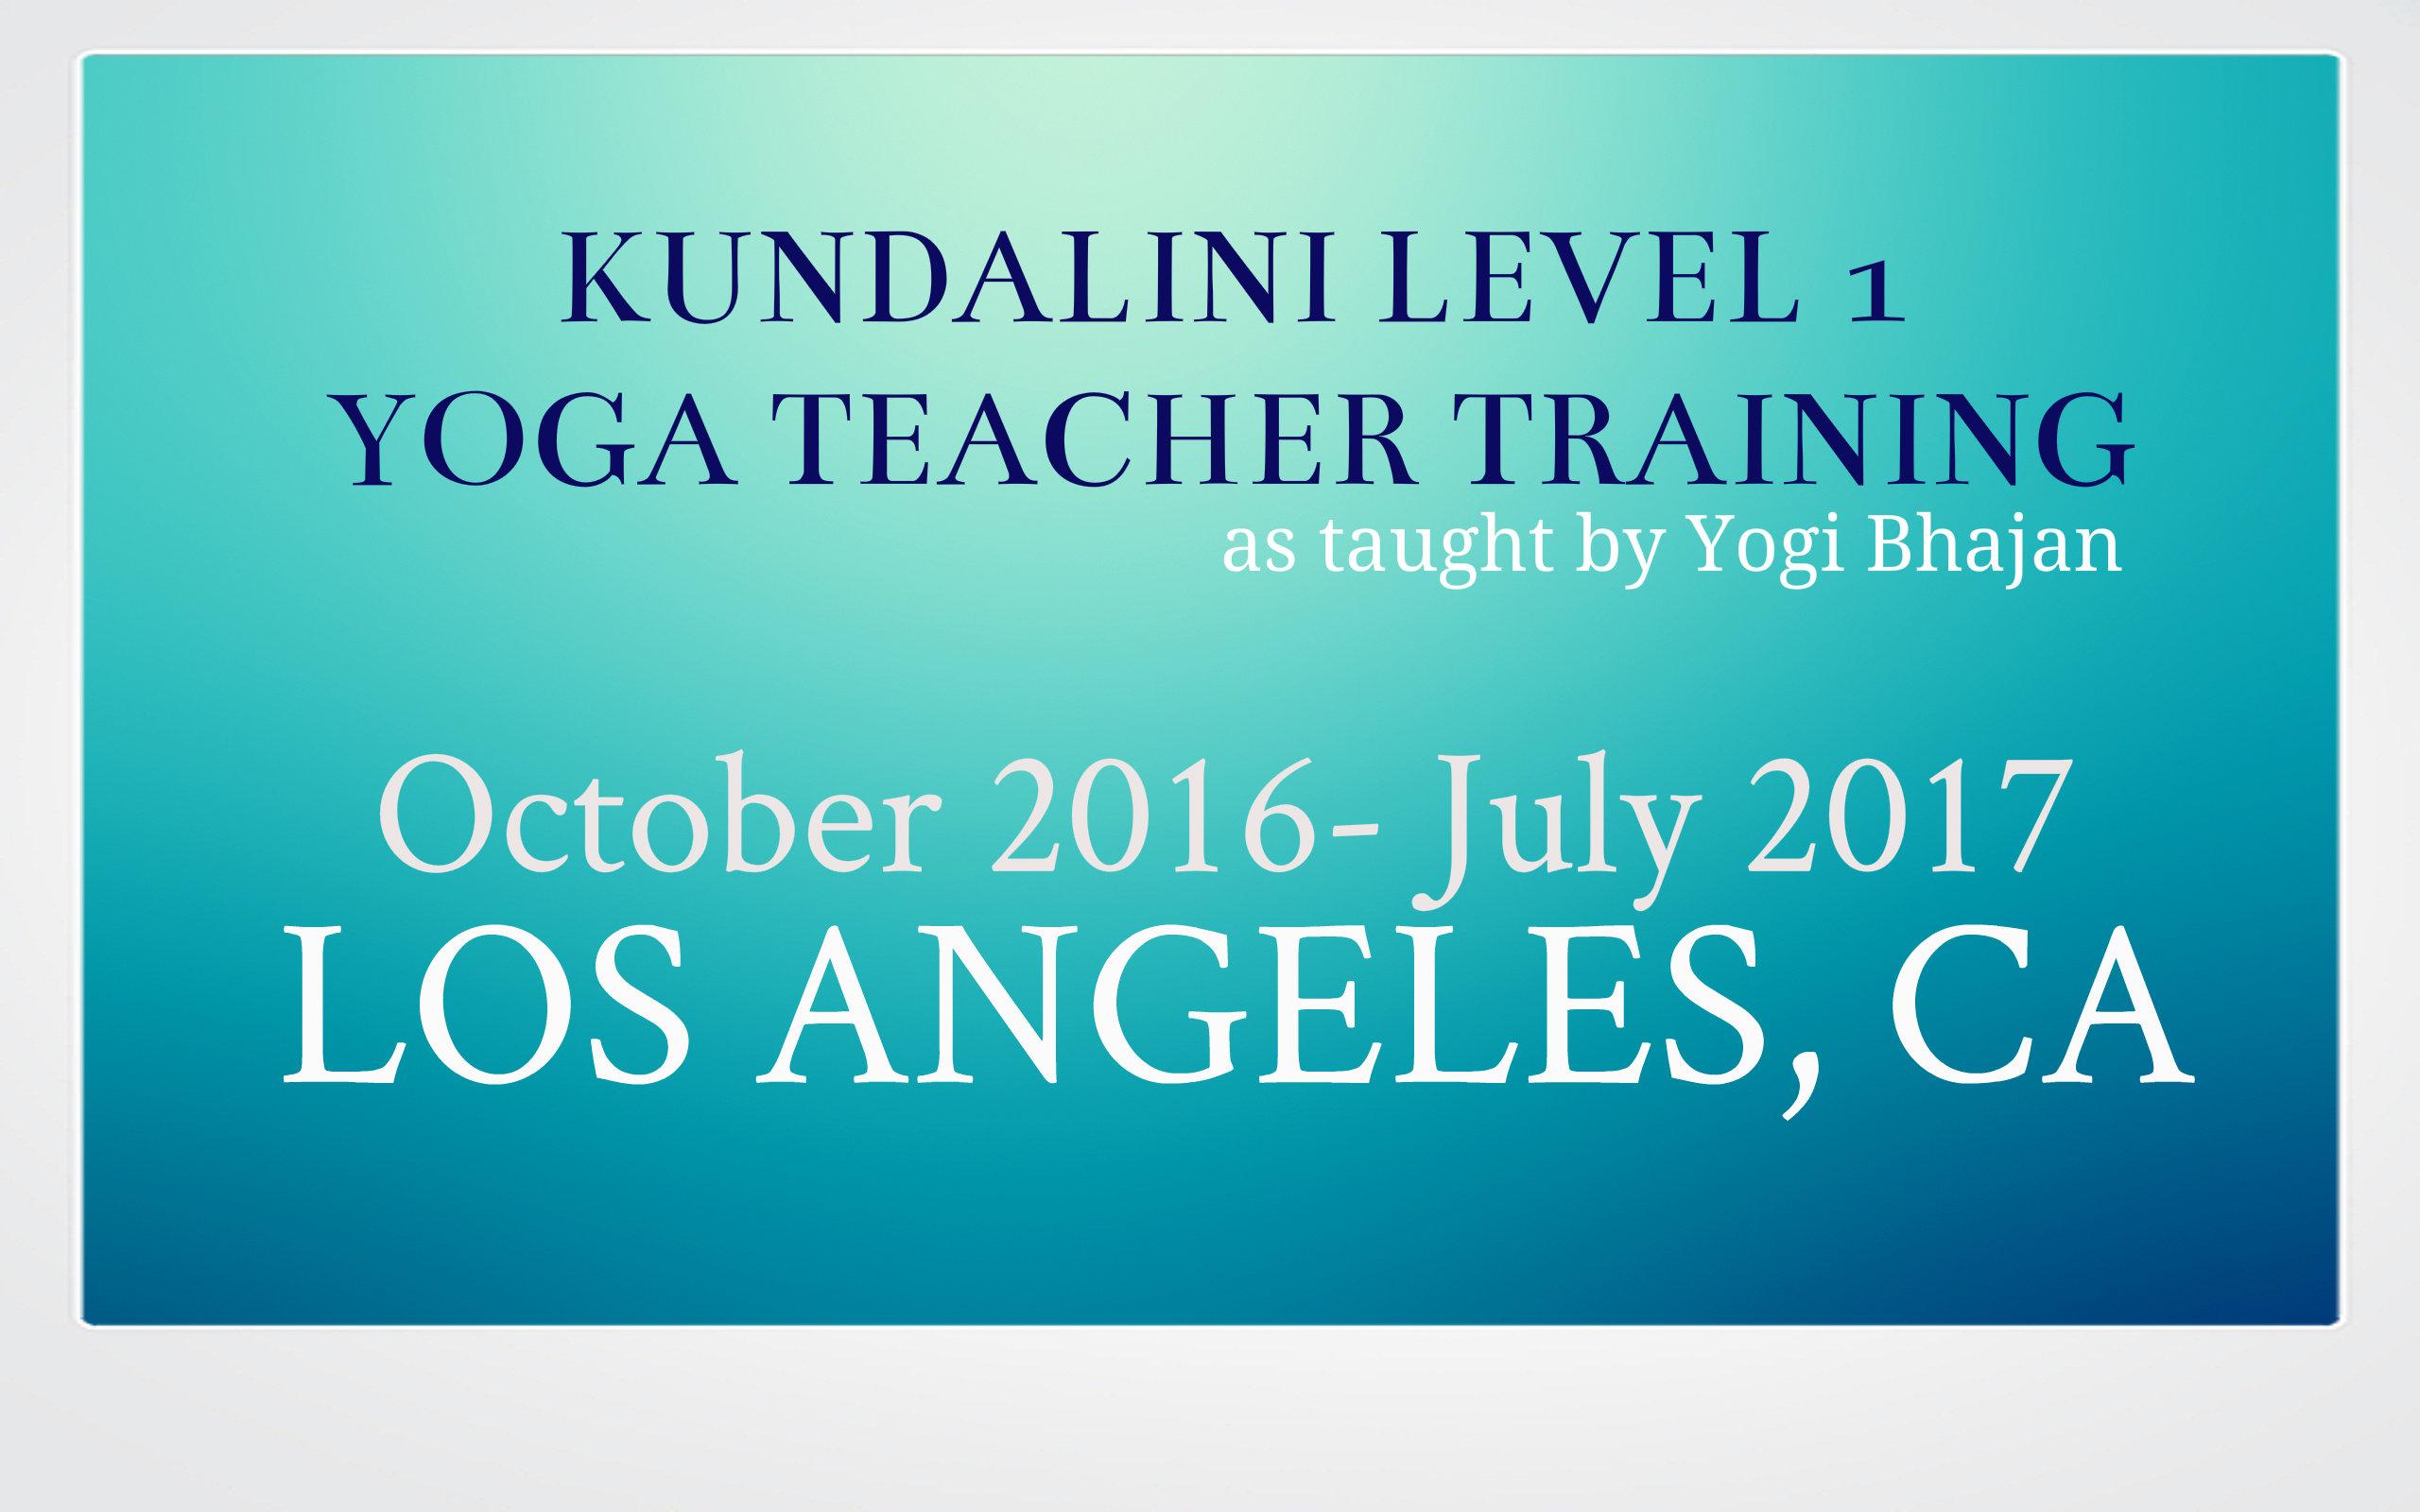 Level 1 Kundalini Teacher Training 2016-2017: Los Angeles